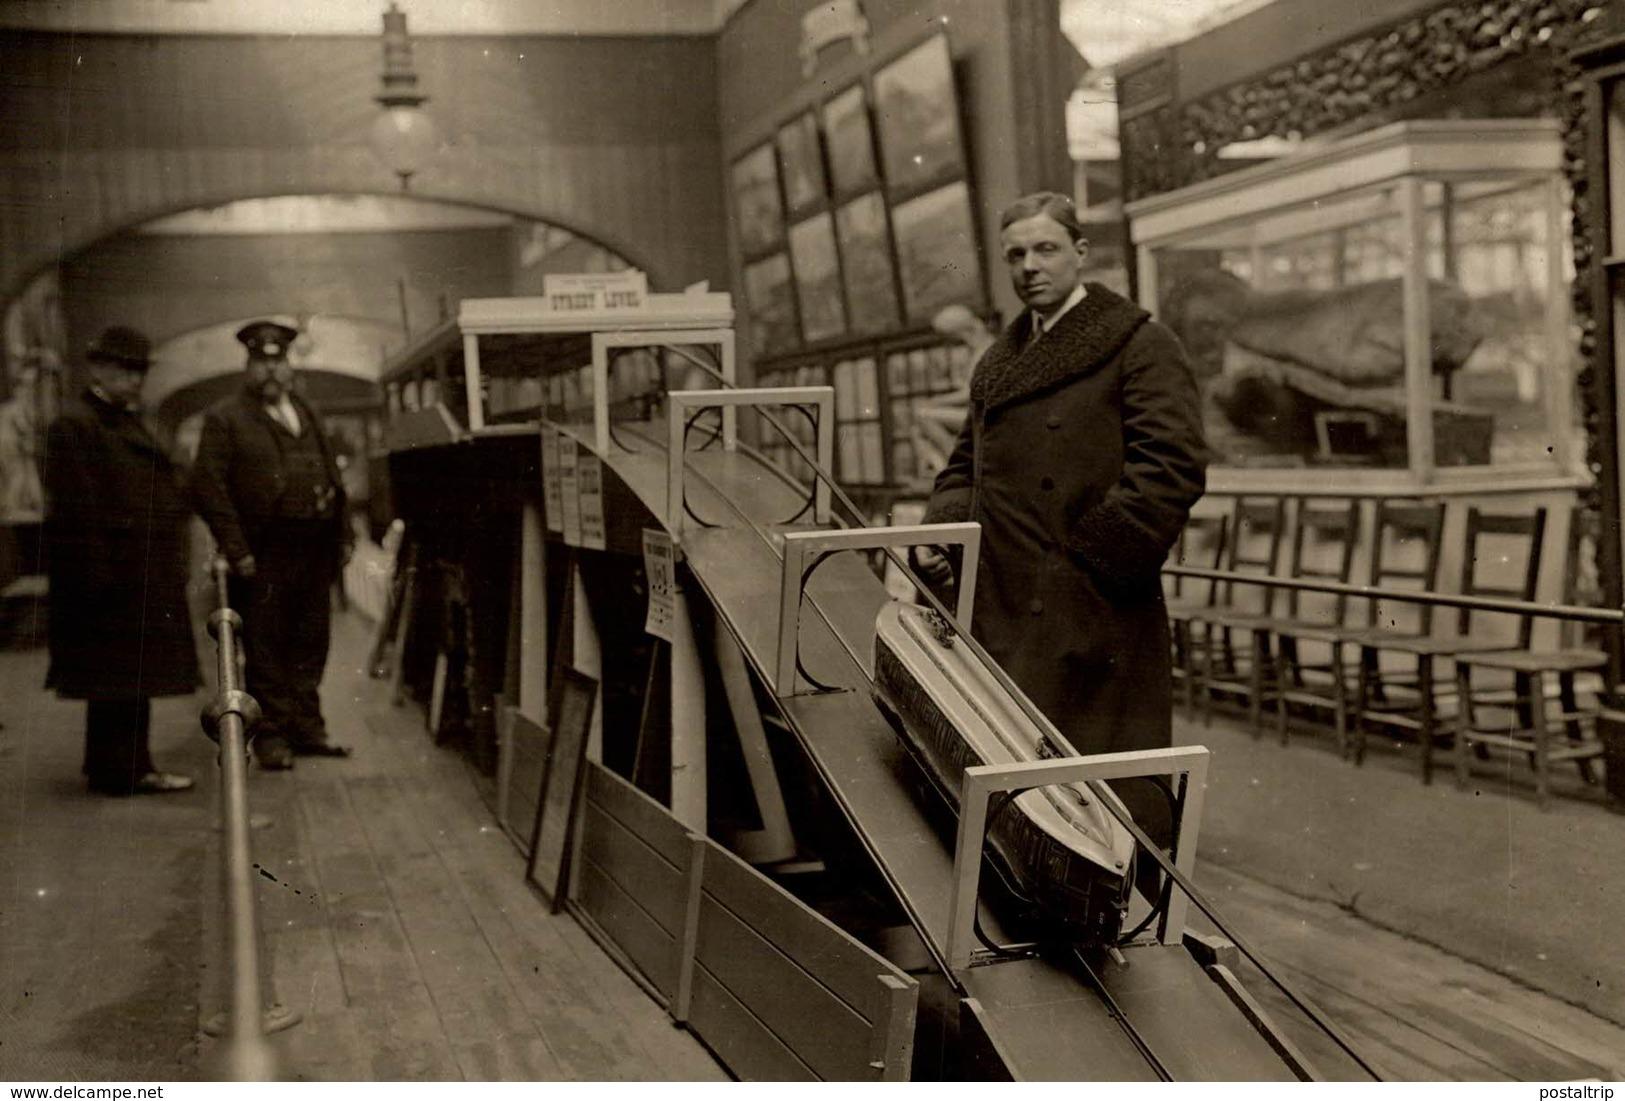 DEMONSTRATION AT CRYSTAL PALACE KEARNY SINGLE TUBE RAILWAY CHEMIN DE FER EISENBAHN 15*11CM Fonds Victor FORBIN 1864-1947 - Trains